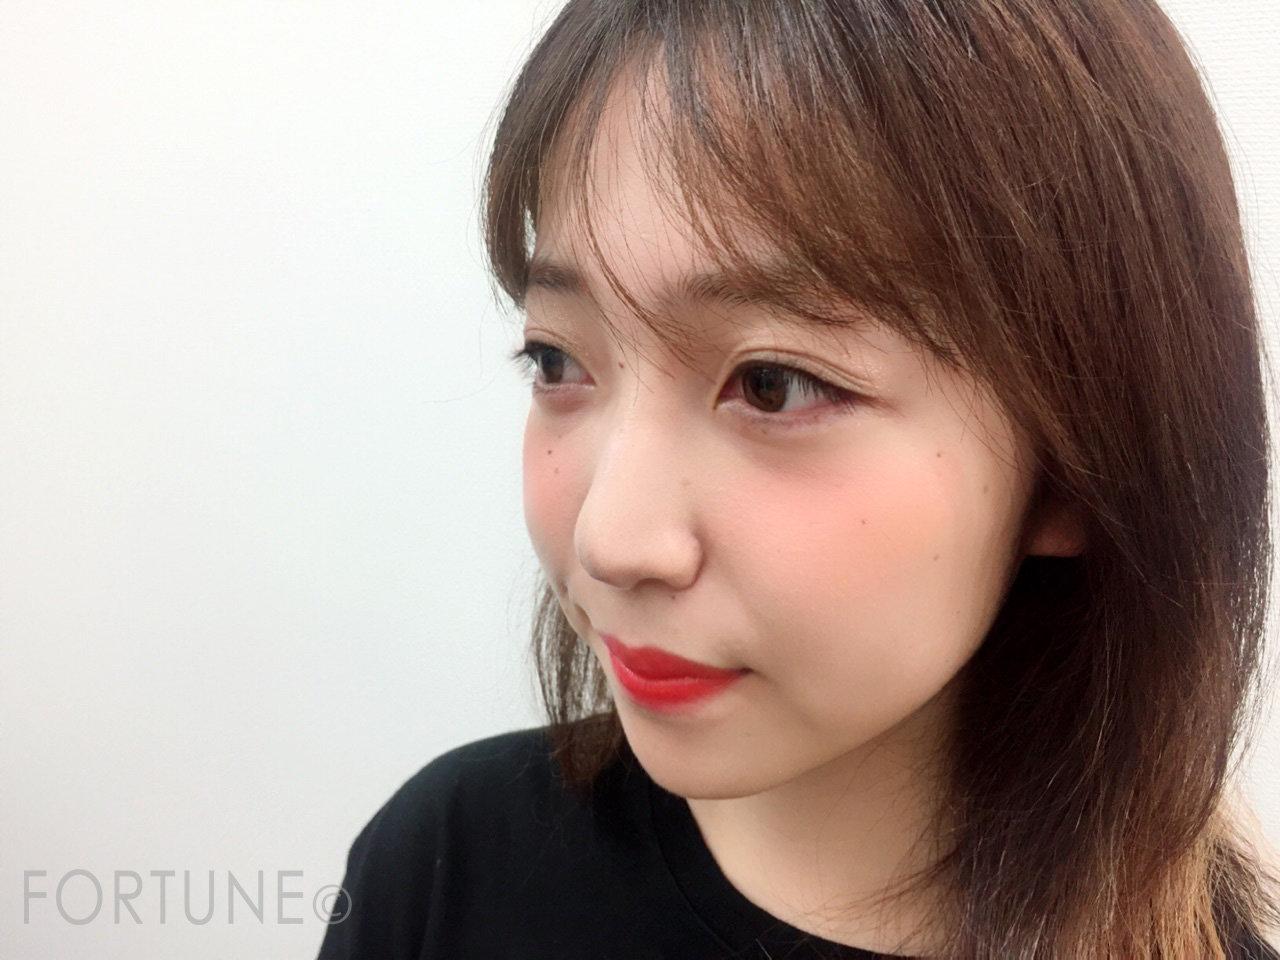 rms beauty(アールエムエスビューティー) lip cheek(リップチーク) lip shine(リップシャイン) 2017秋冬新作コスメ